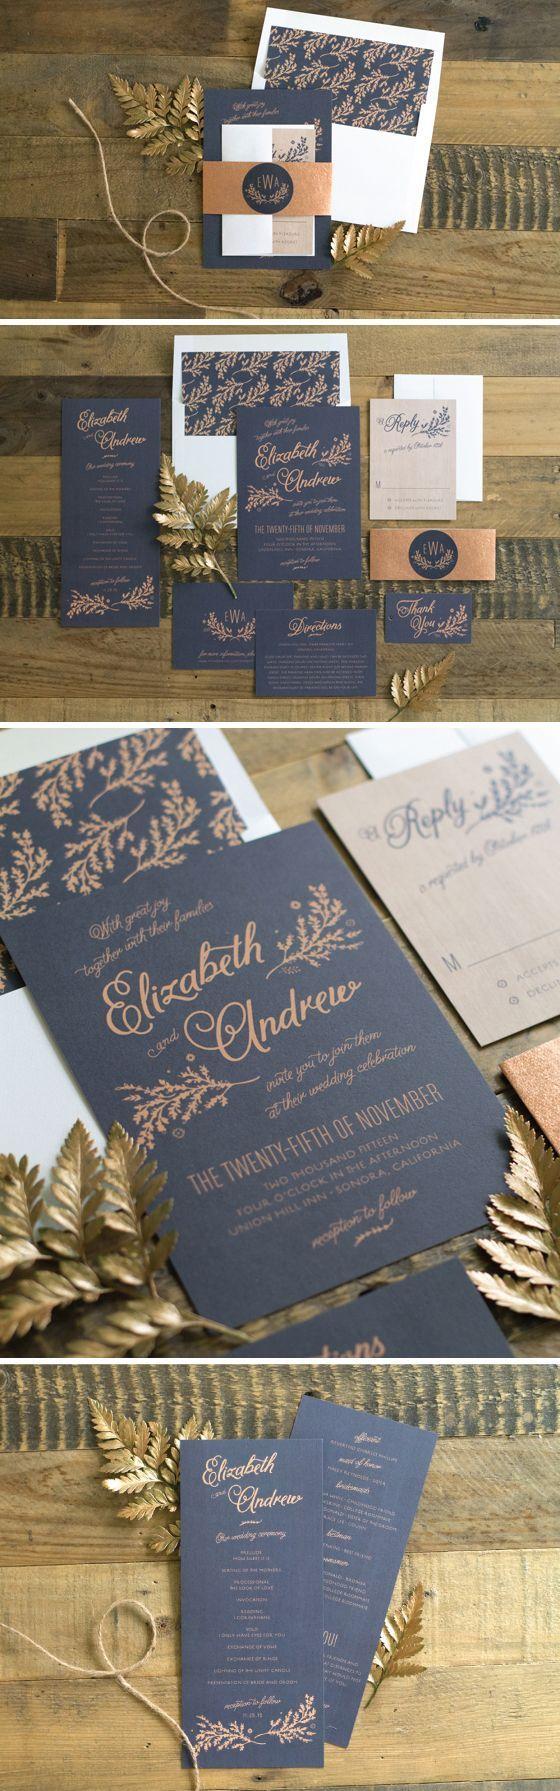 Rustic Wedding Invitations in Navy 140 best